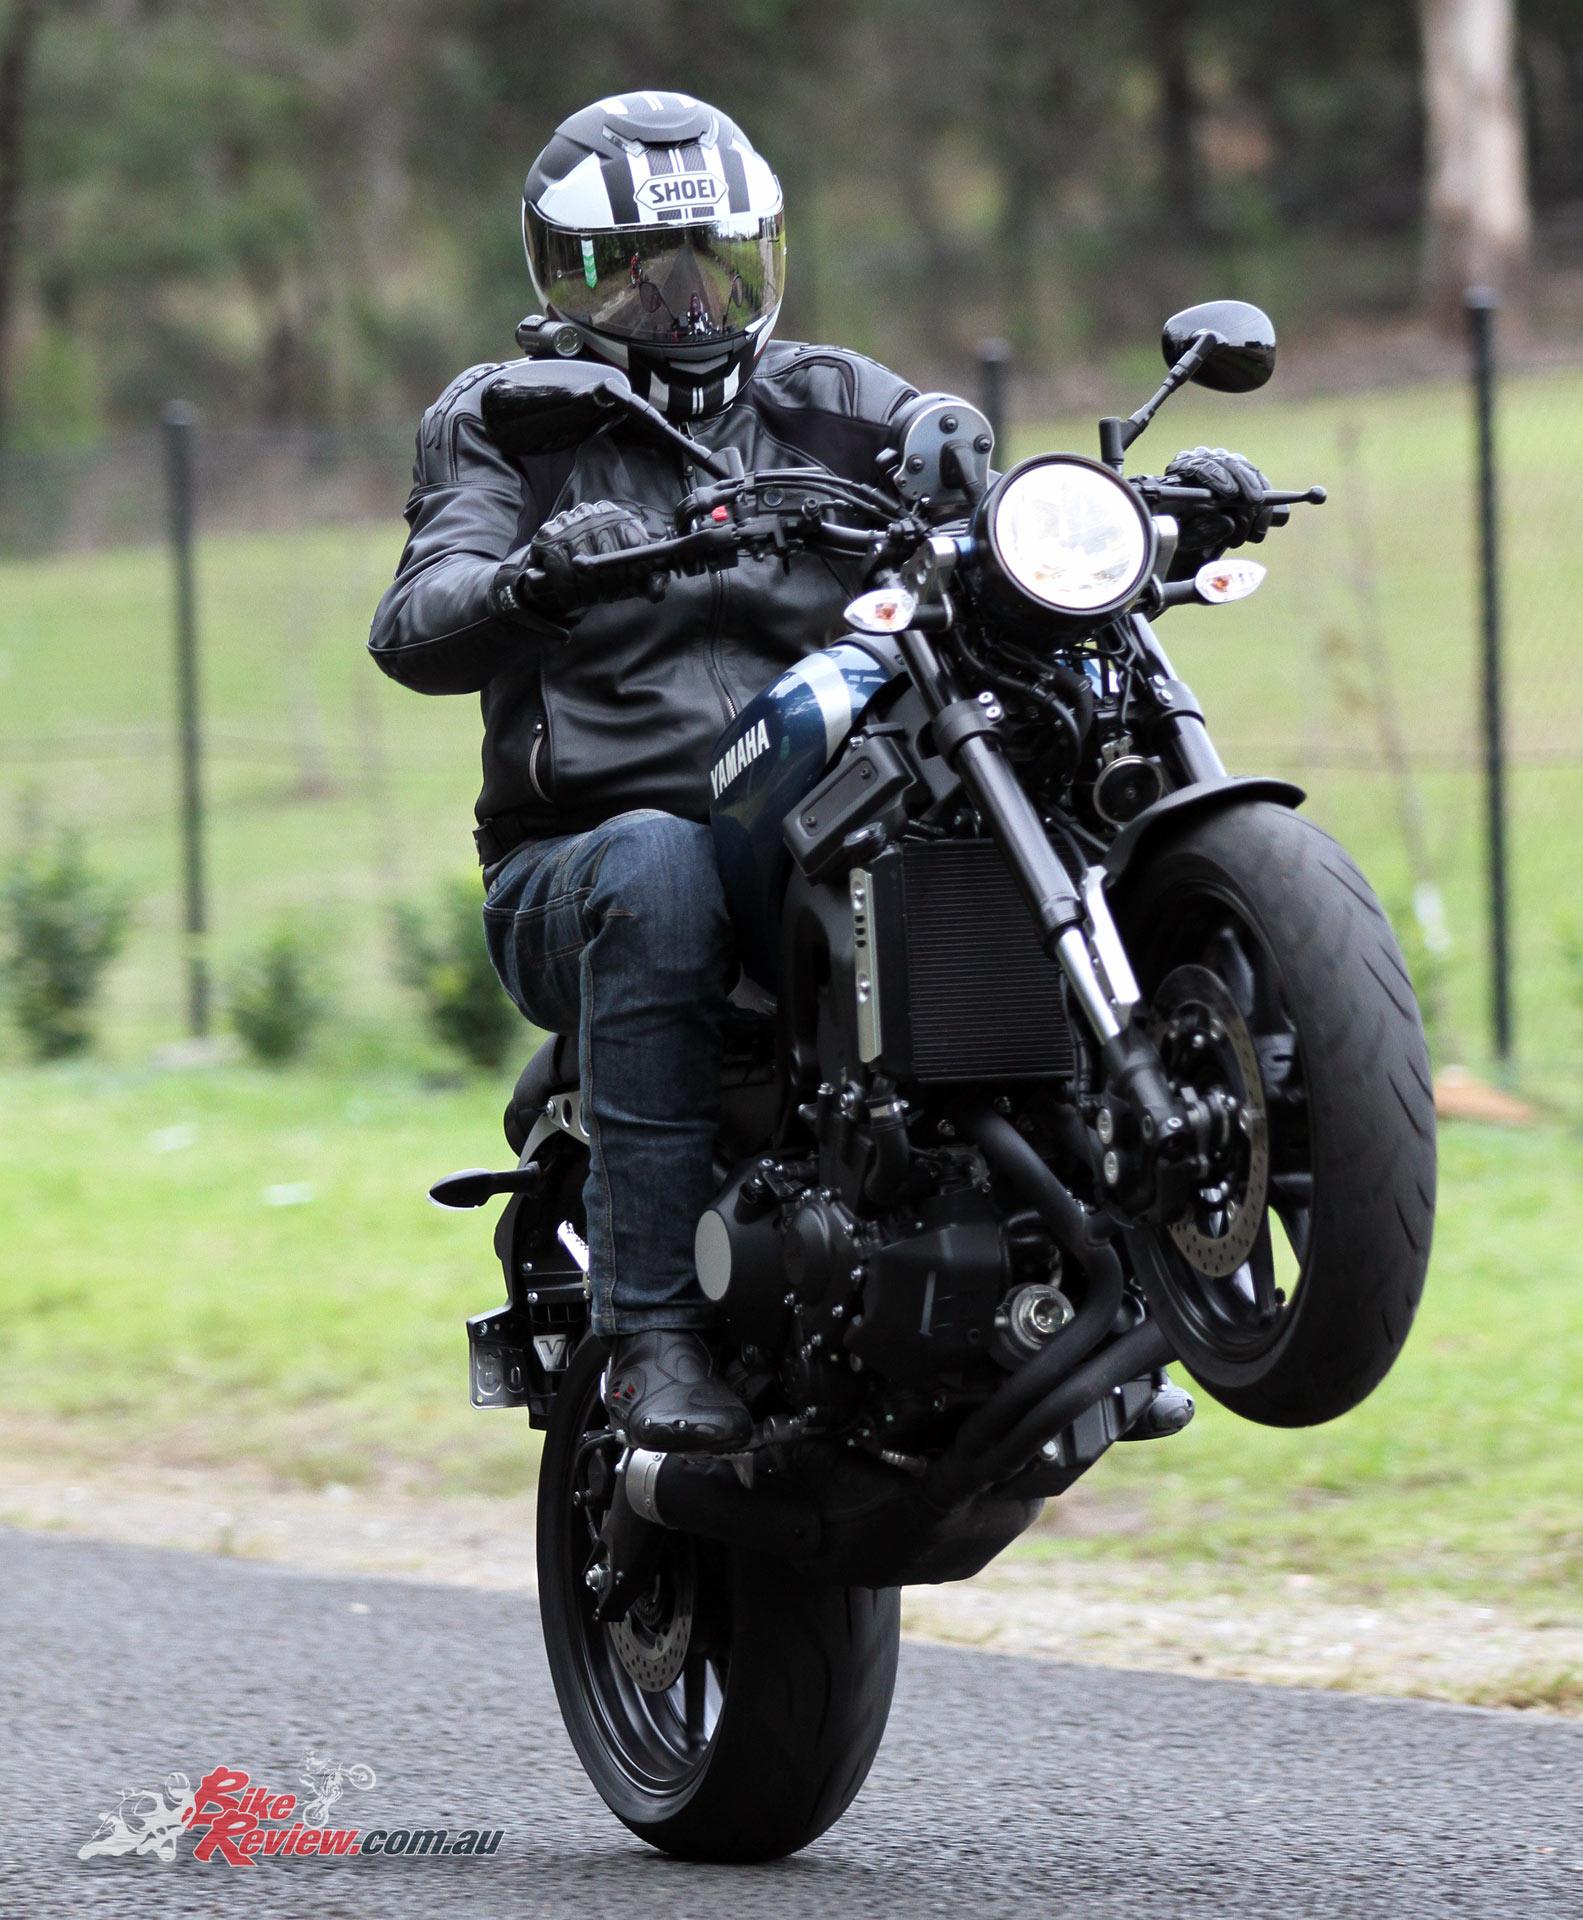 Review: 2017 Yamaha XSR900